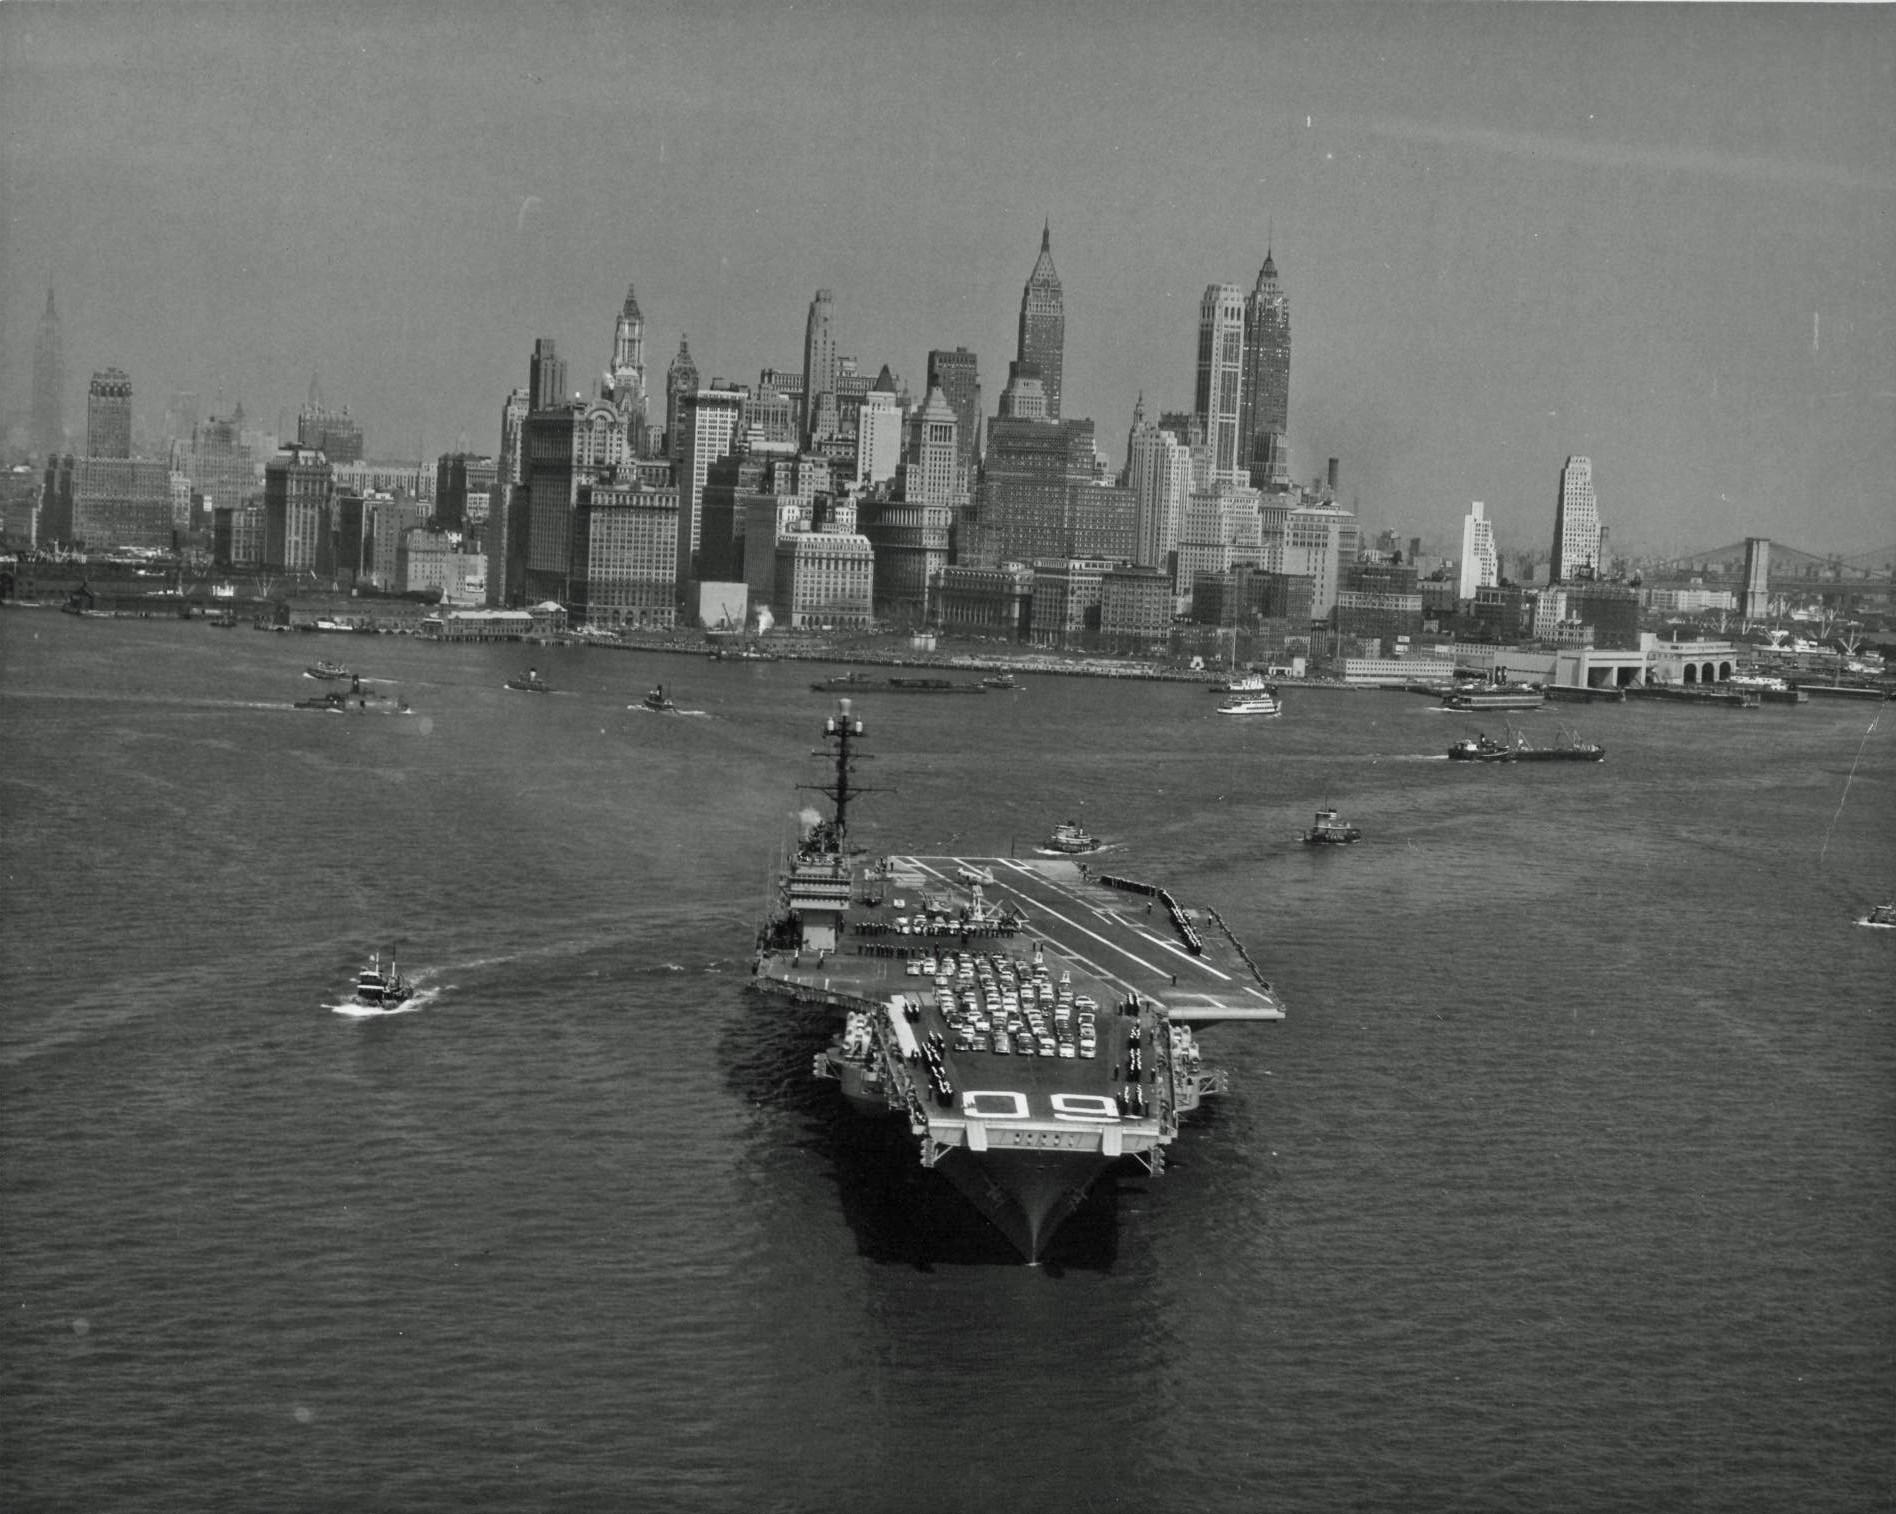 New York port, 1950s, 1950s New York